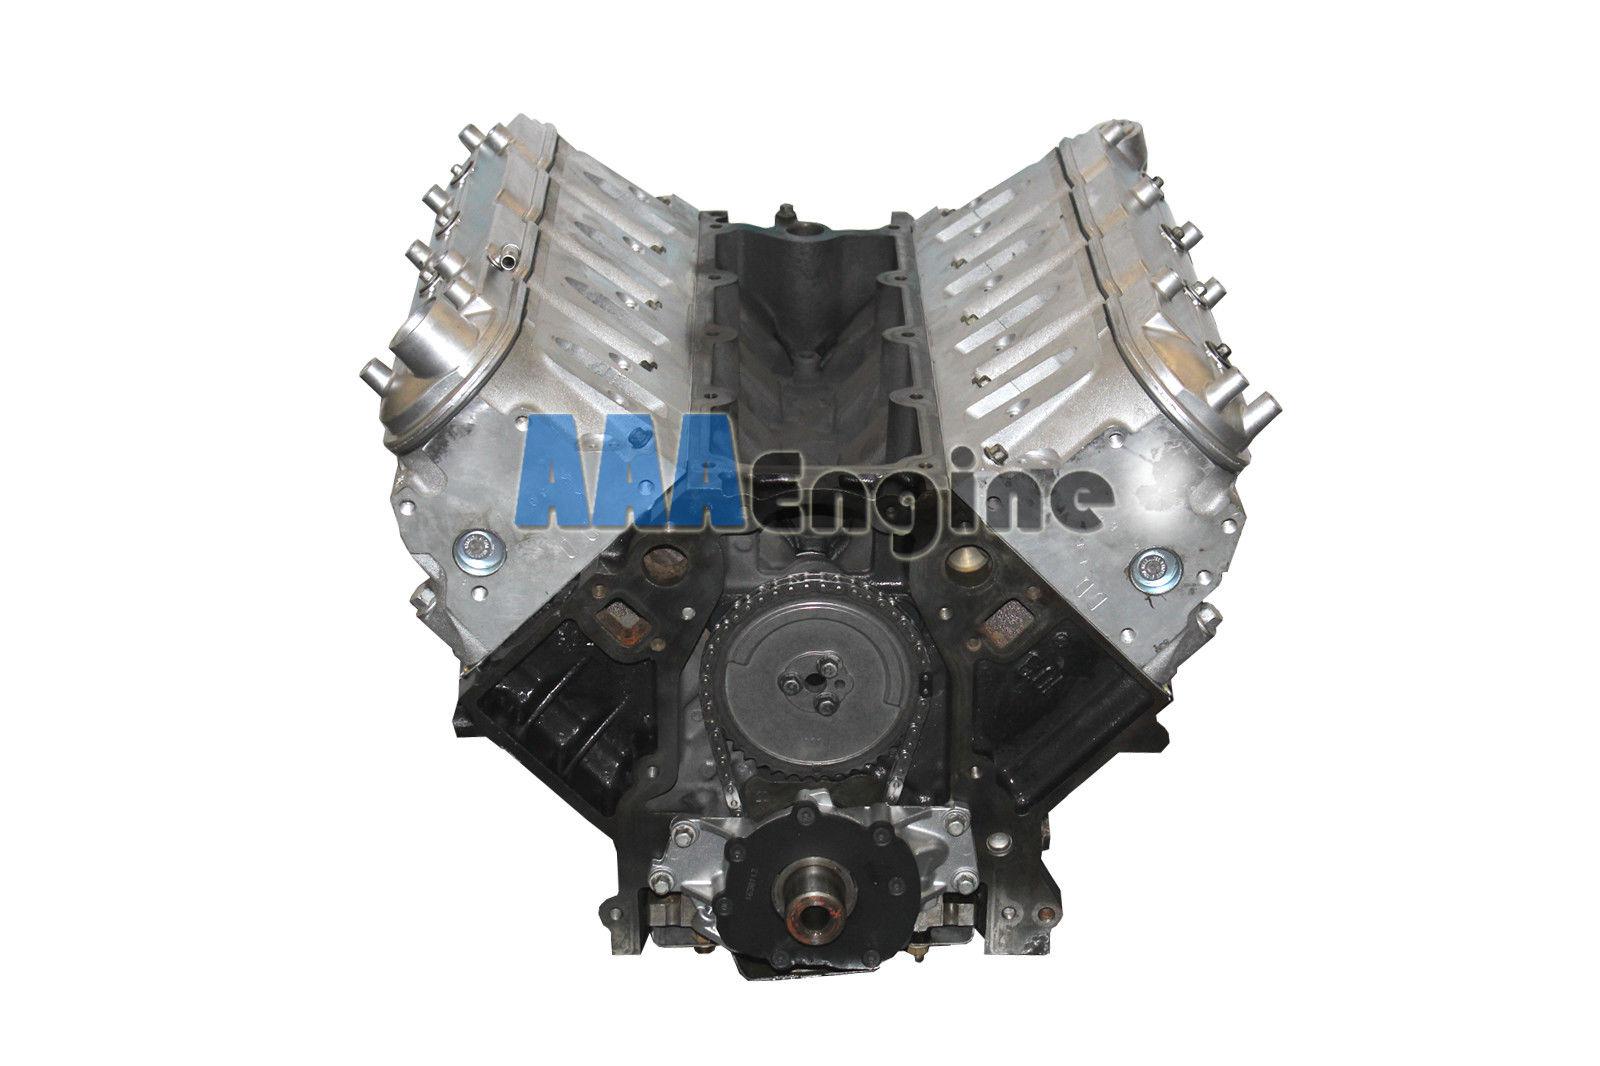 engine chevy vortec 2005 silverado 1999 corvette 0l yukon vin specs aaa lq4 engines lq9